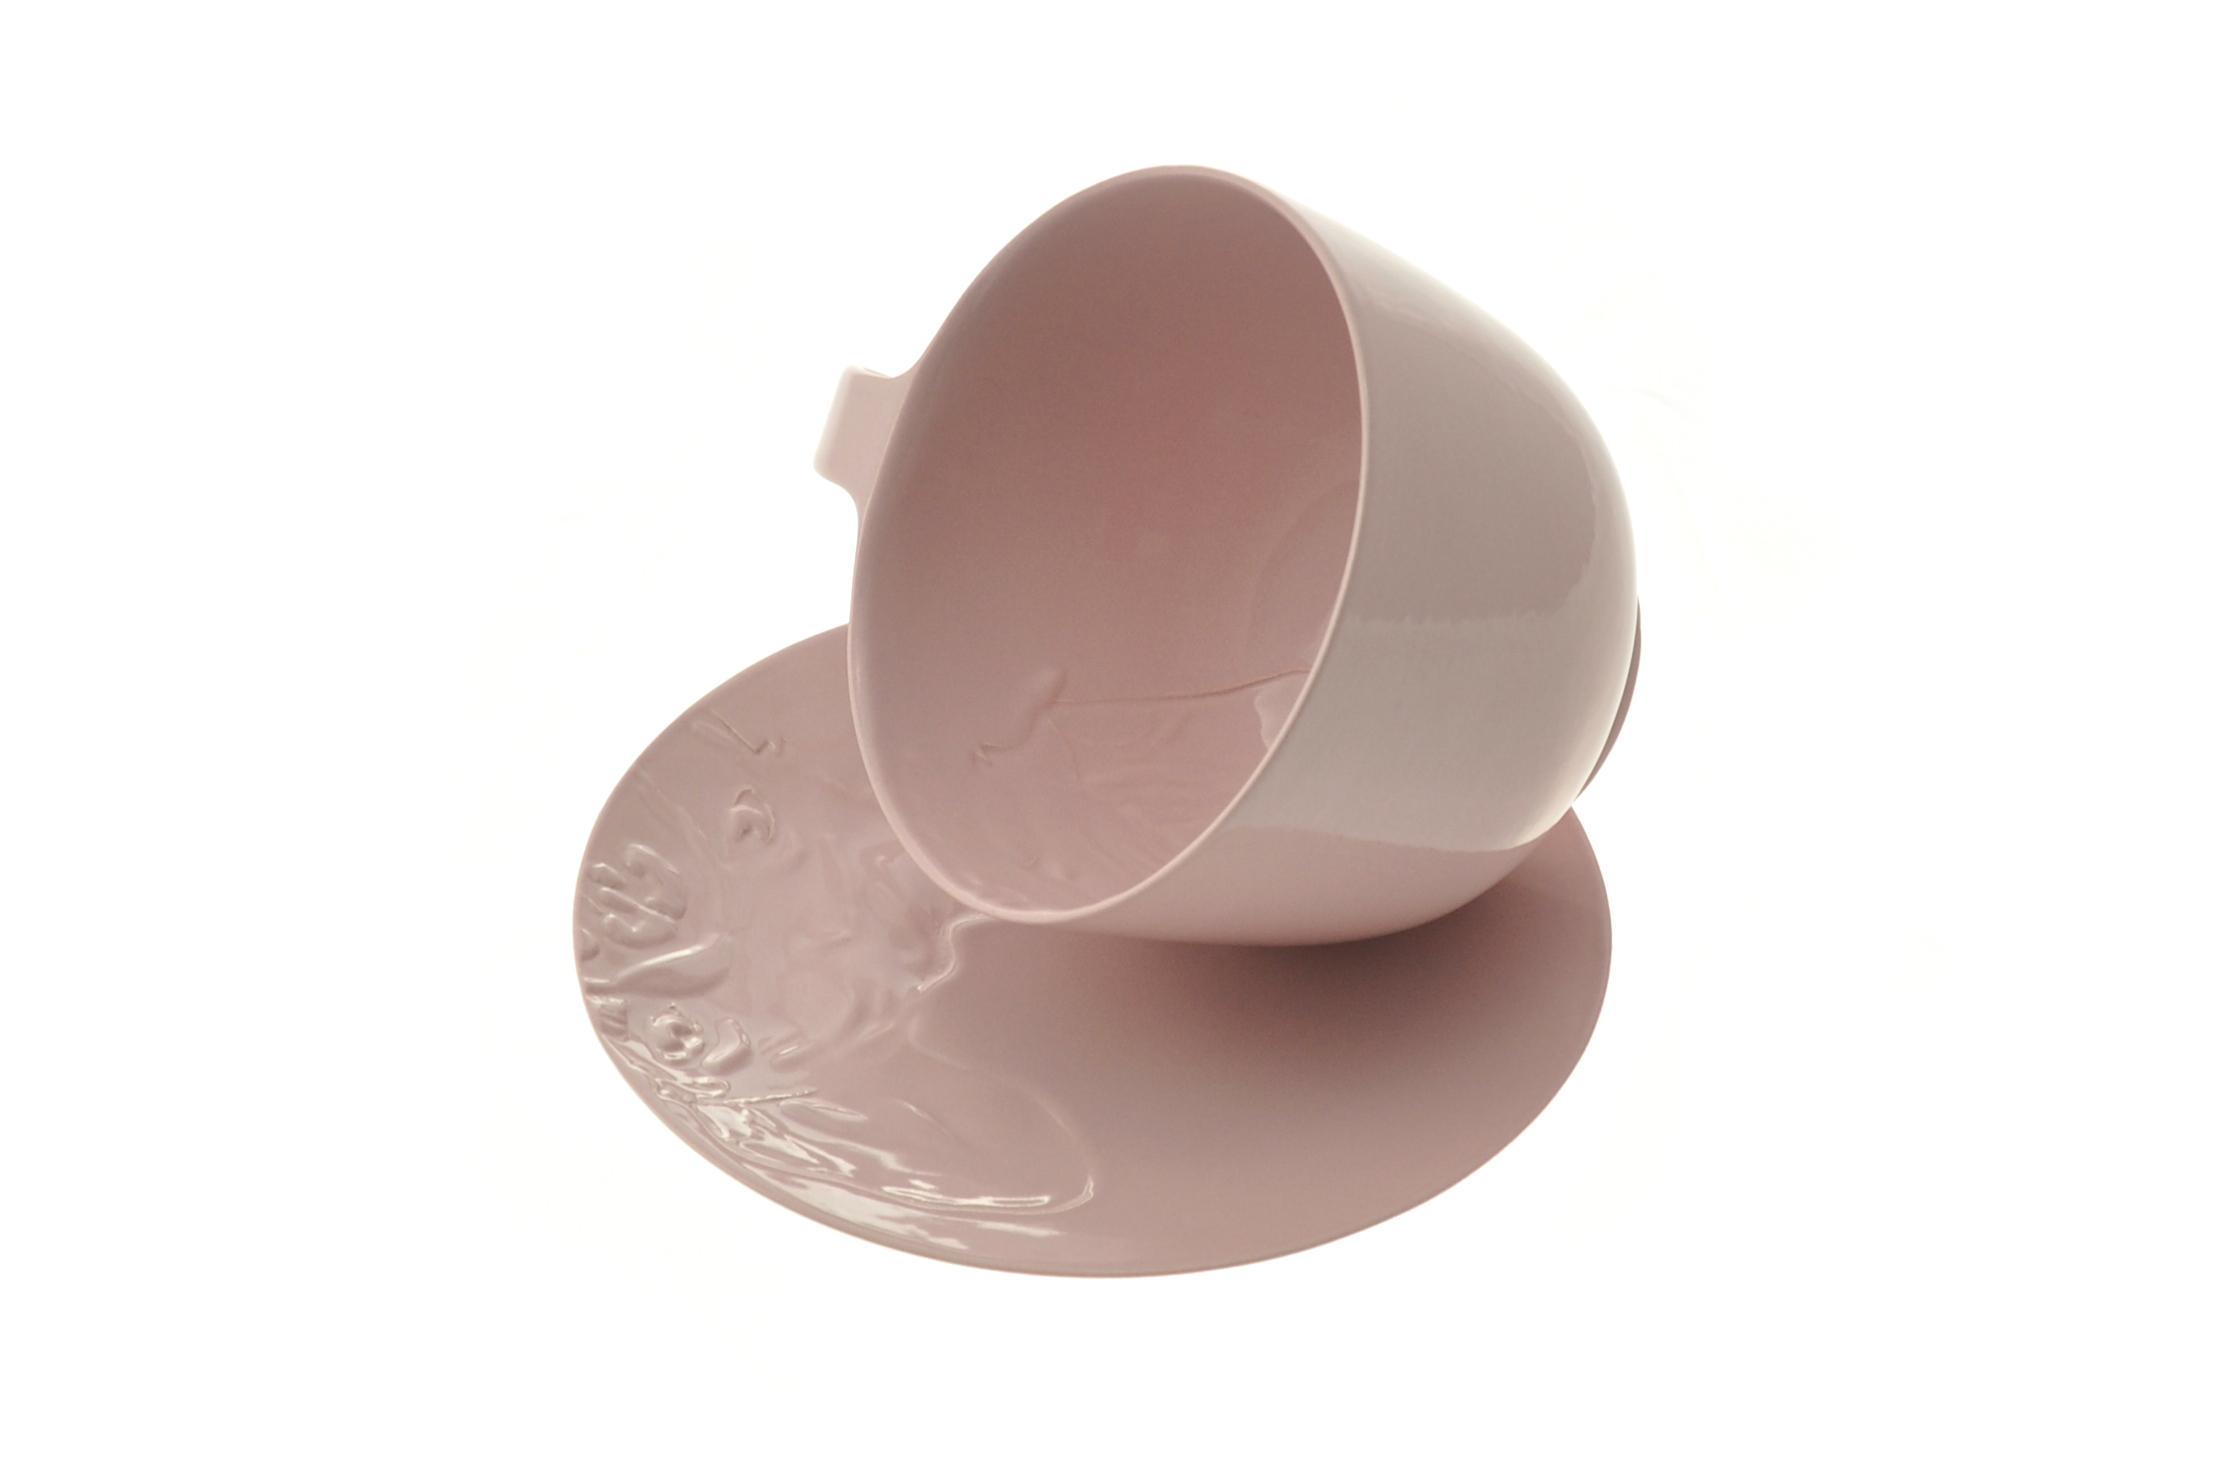 The French bulldog pastel pink series